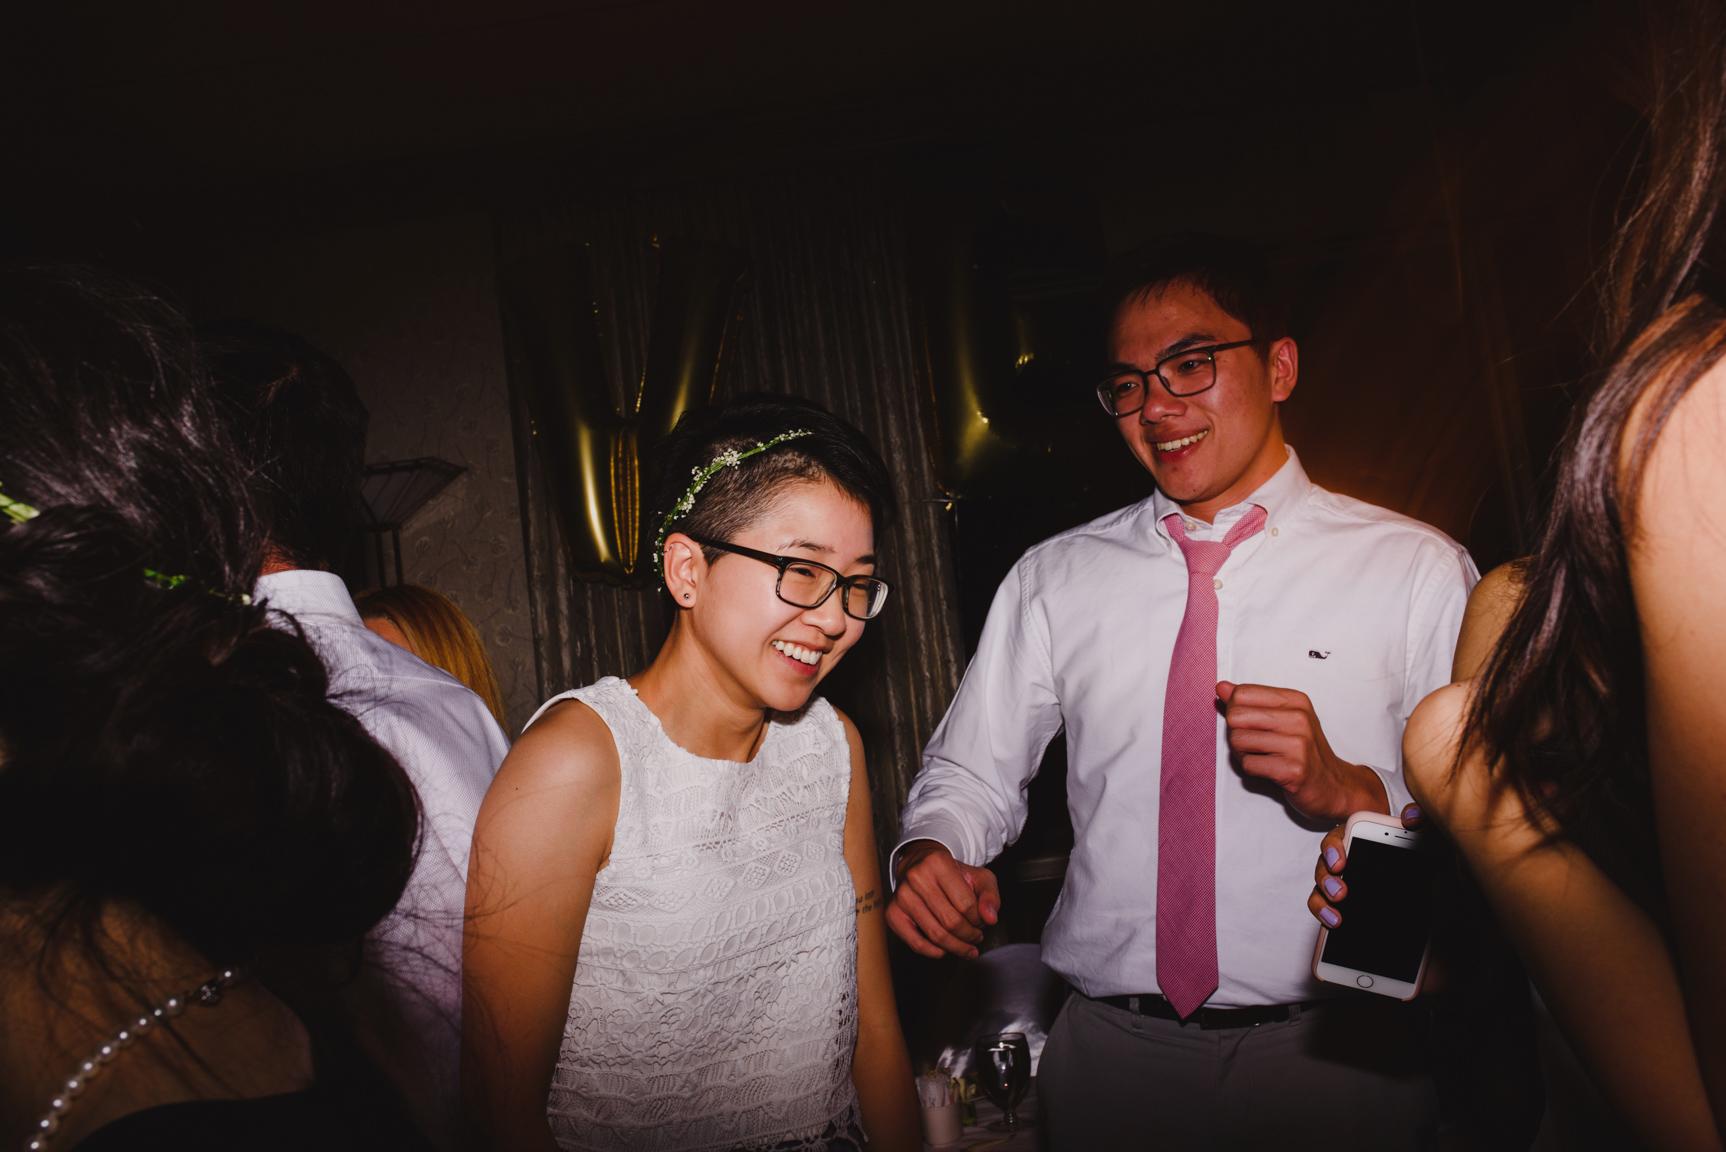 Banff-Wedding-Photography-MichaelChanPhotography81.JPG